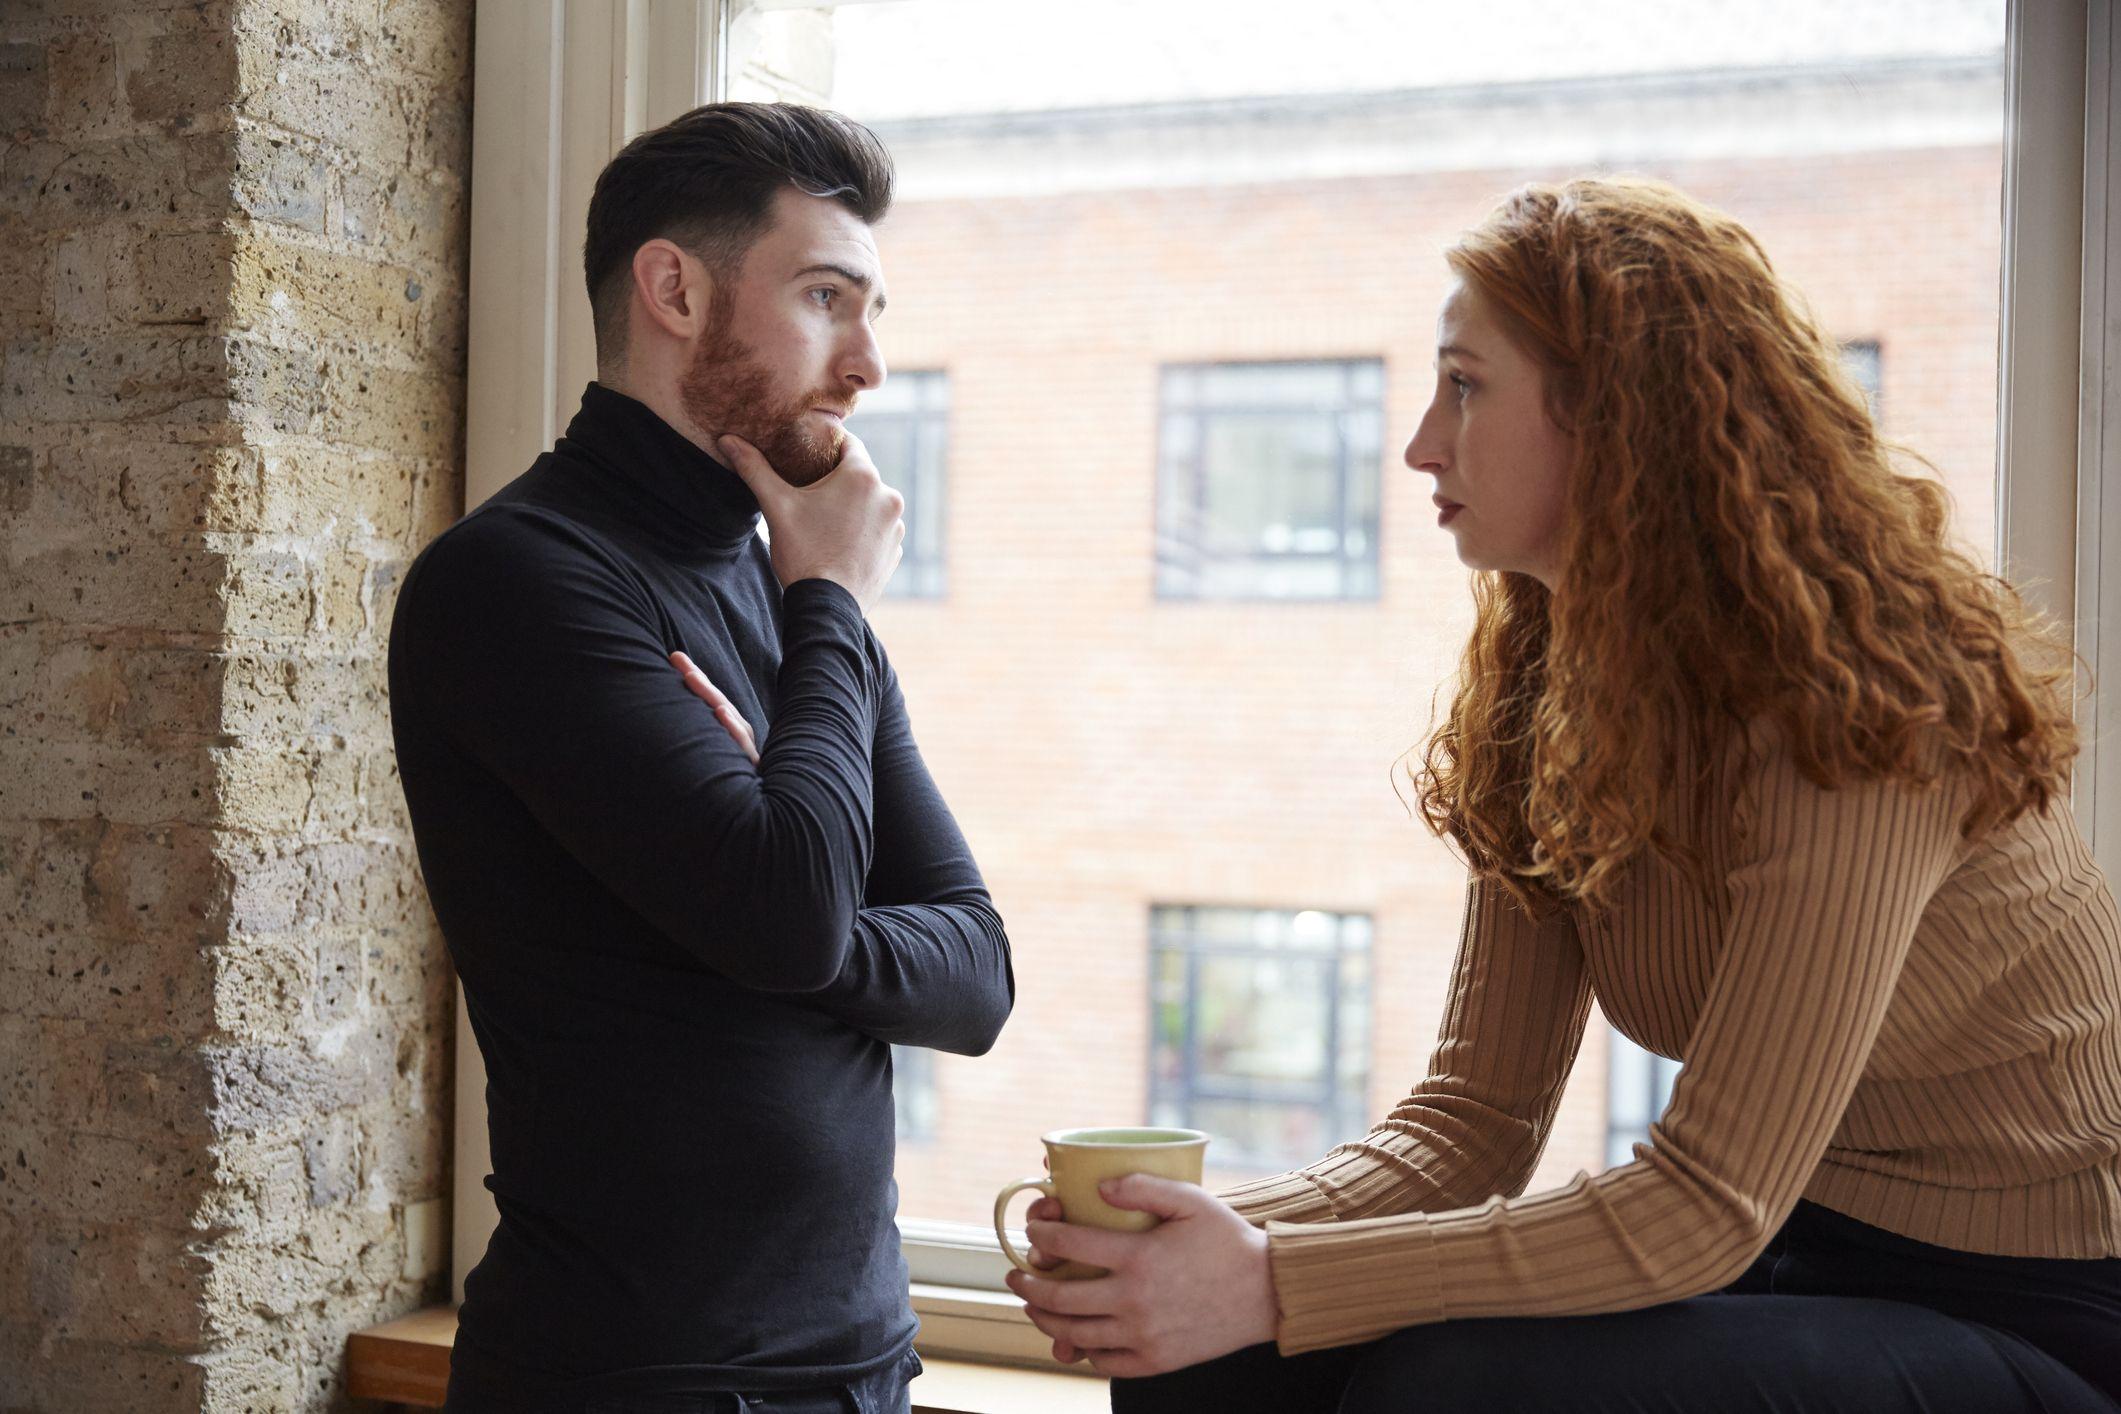 5 signs your spouse should divorce you